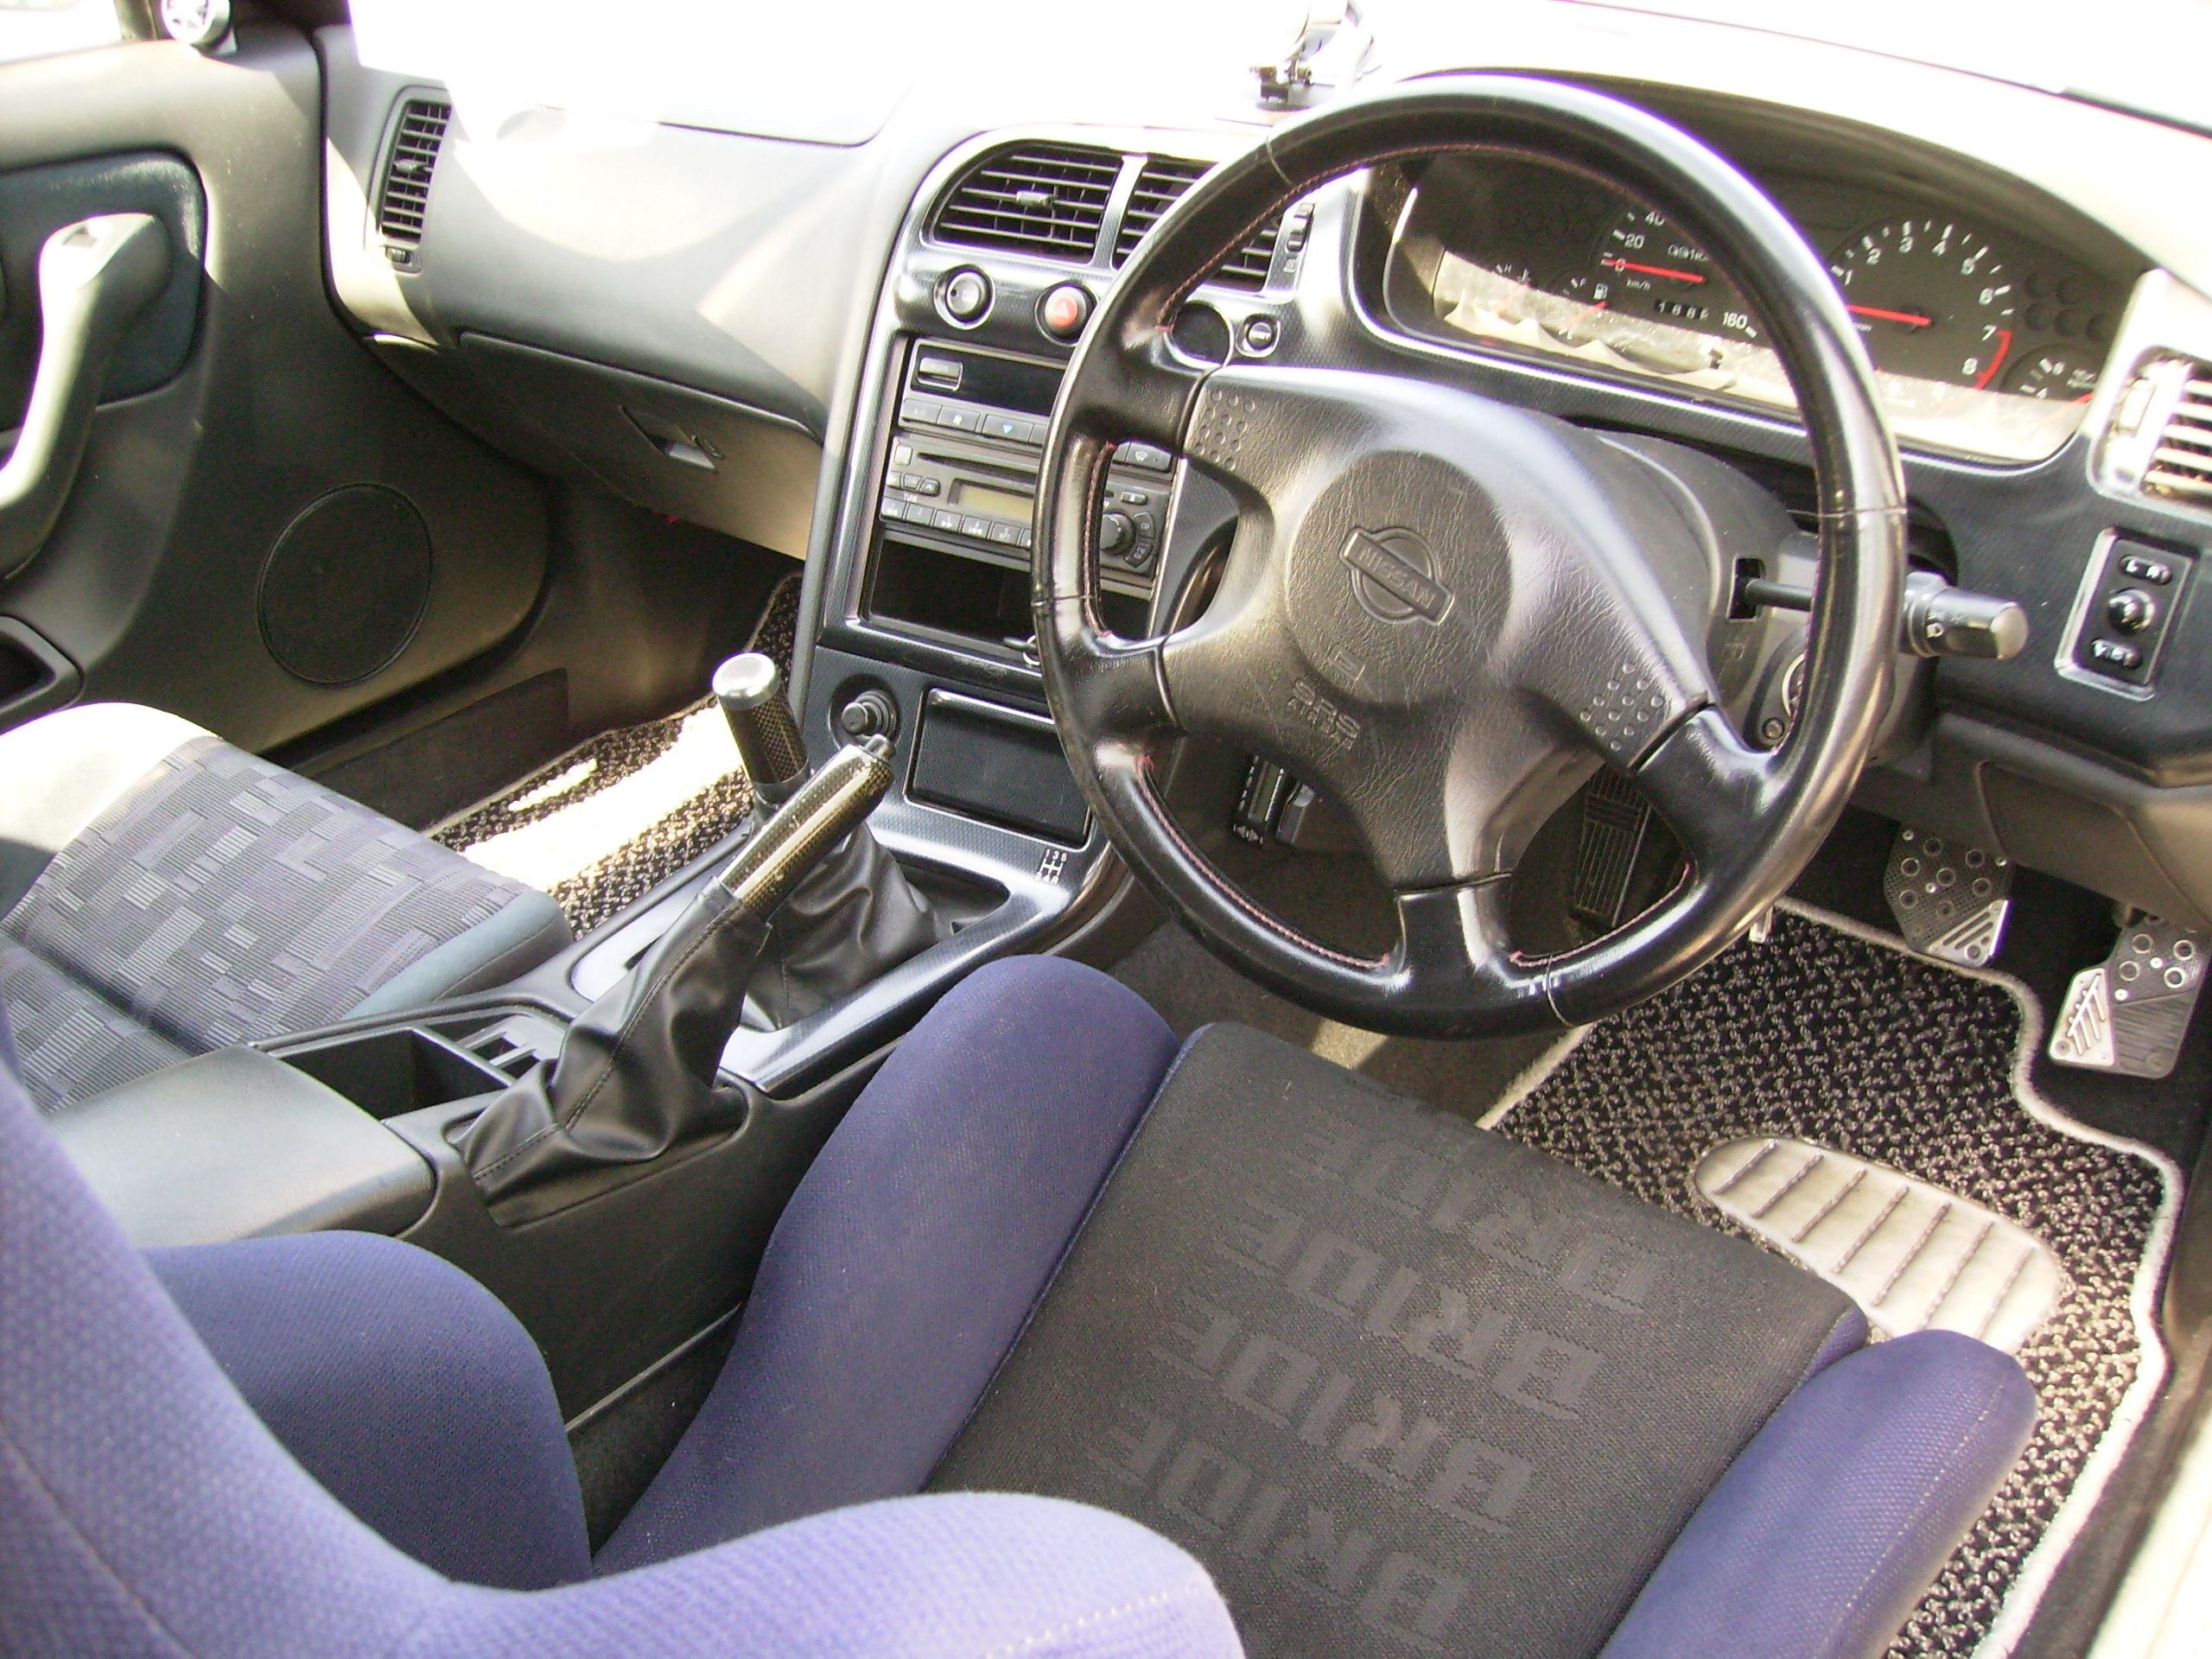 1996 Nissan Skyline R33 Gts-t interior